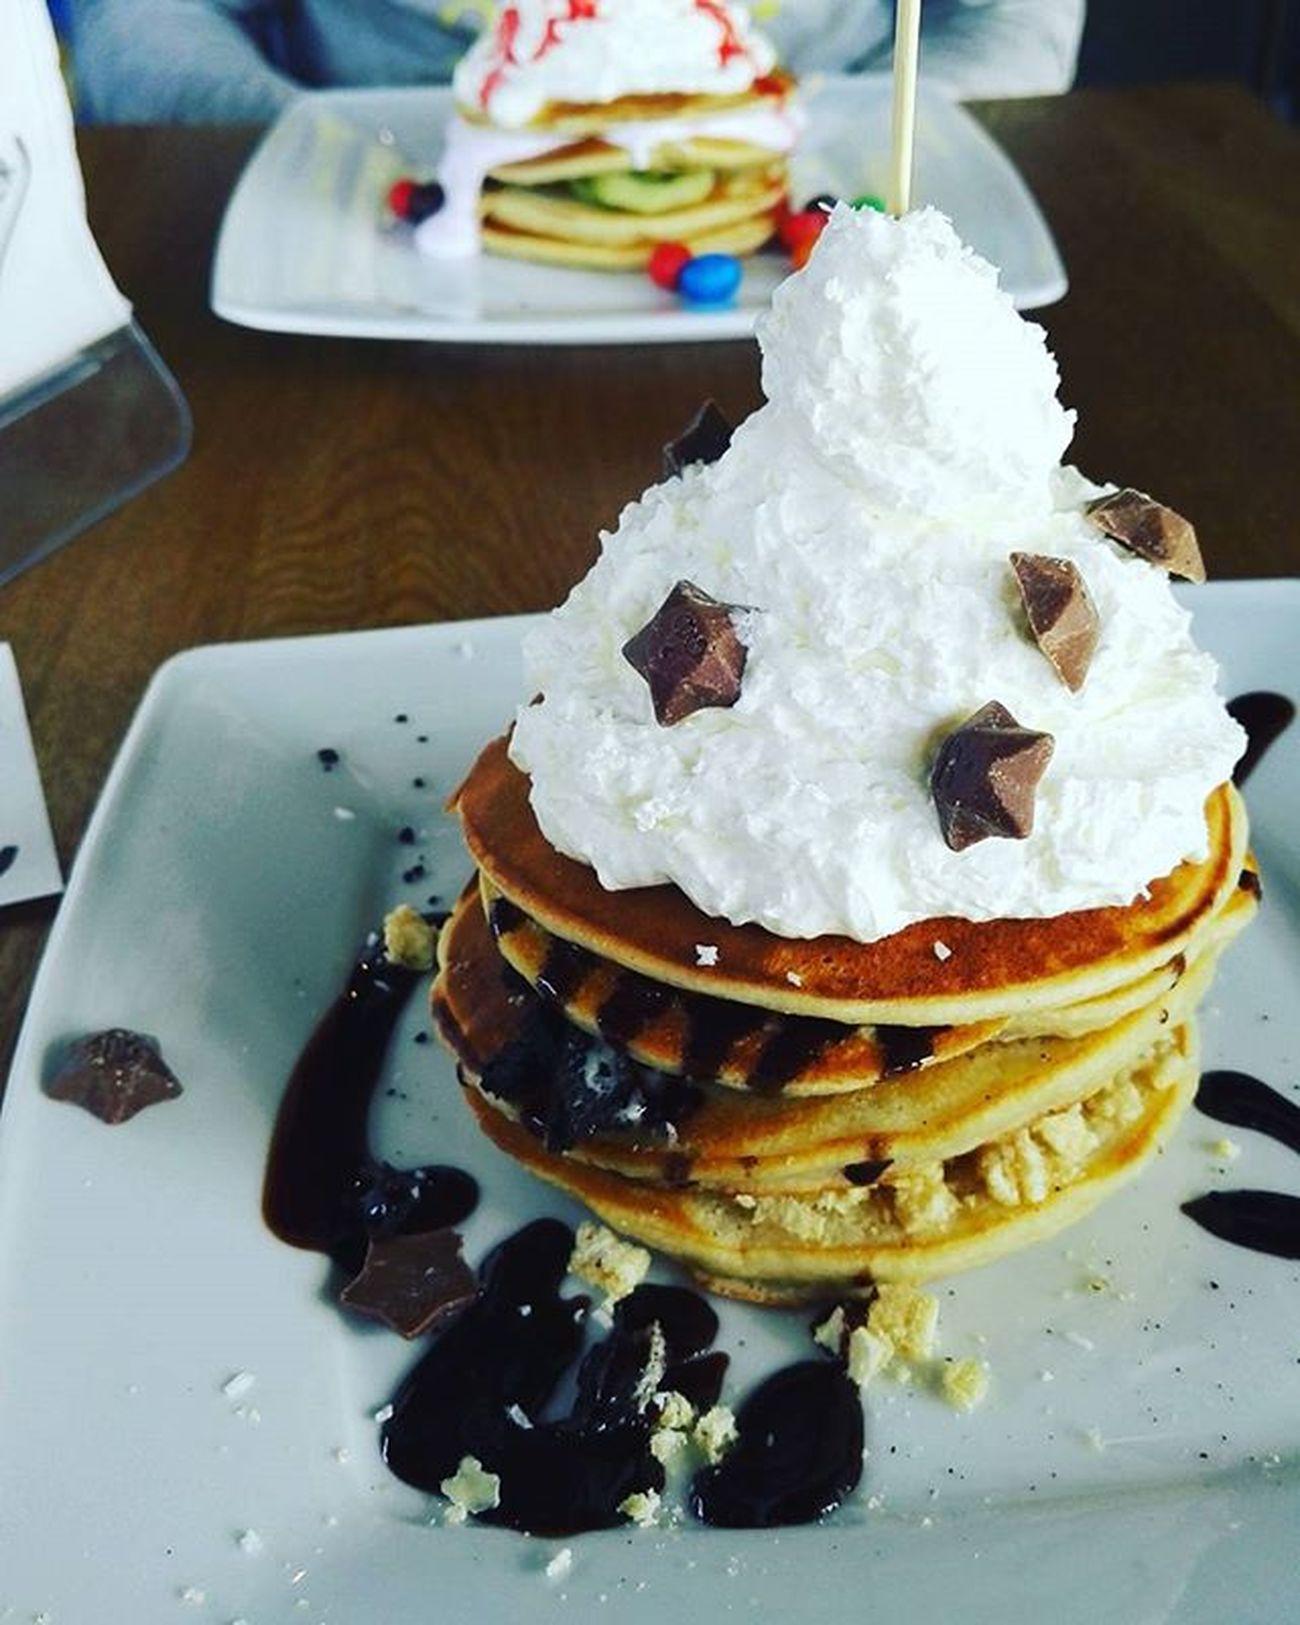 Pancakes Surfburger Love Yummy MagicStars Hersheys Chocolate Cream Candy Breakfast